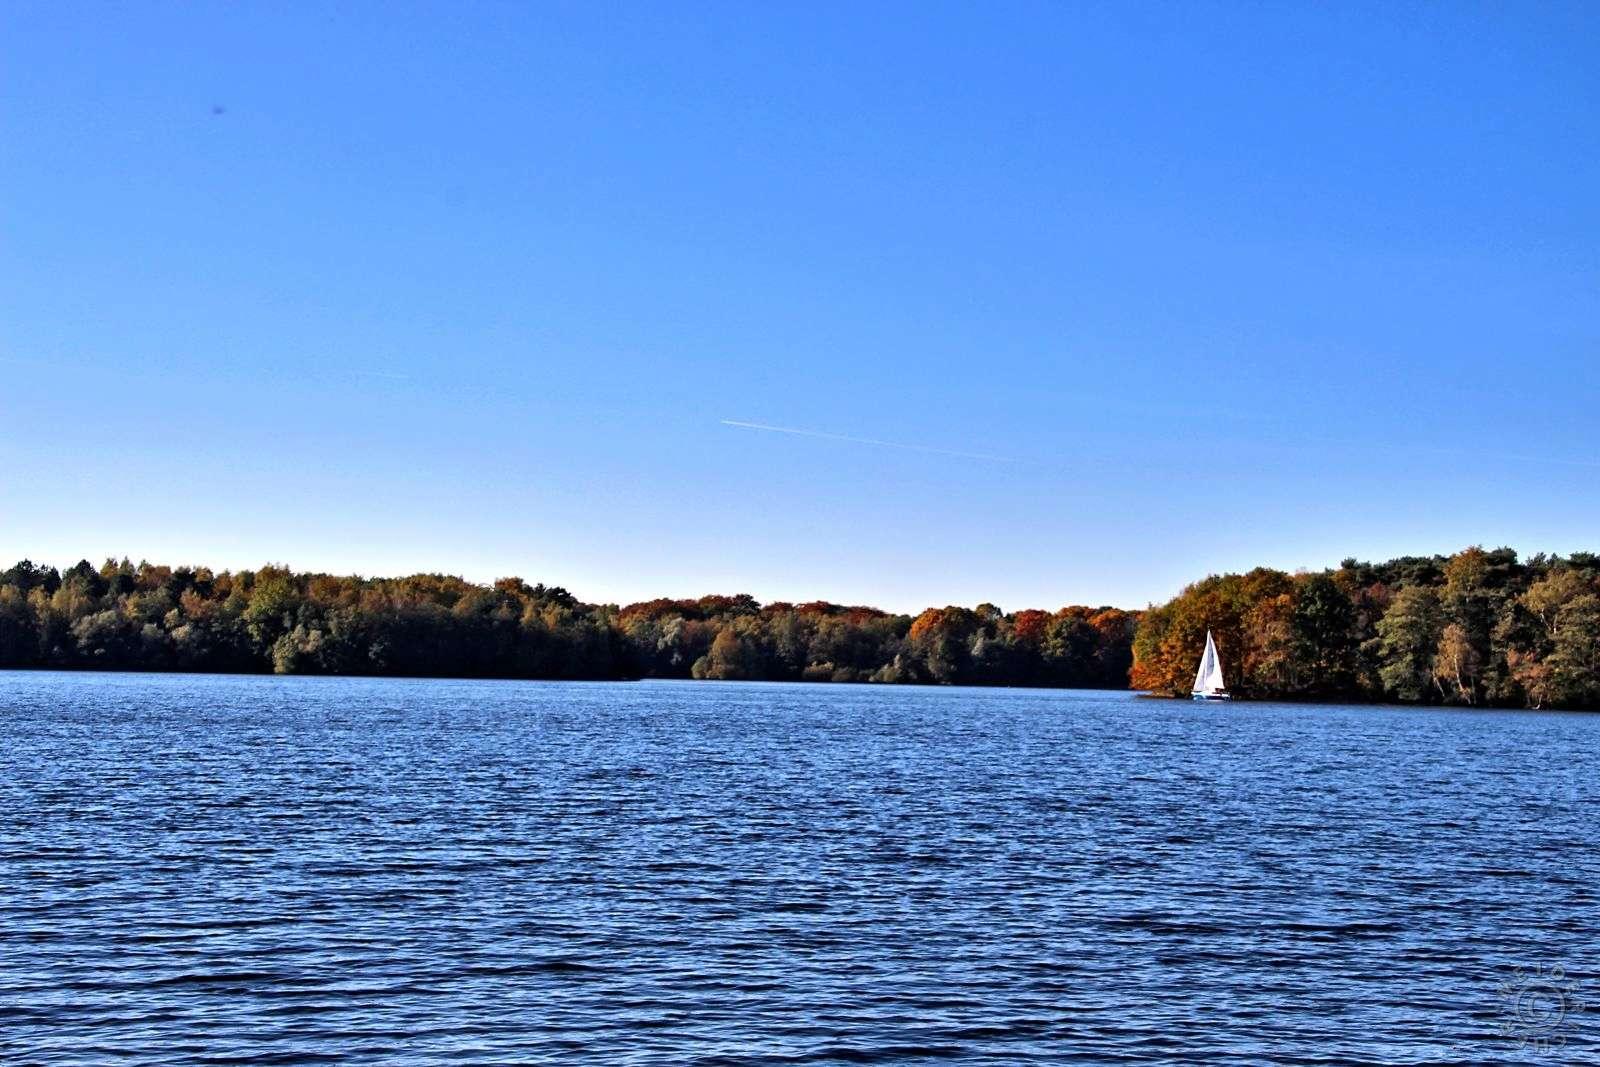 Herbstimpressionen: Sechs Seen Platte 811